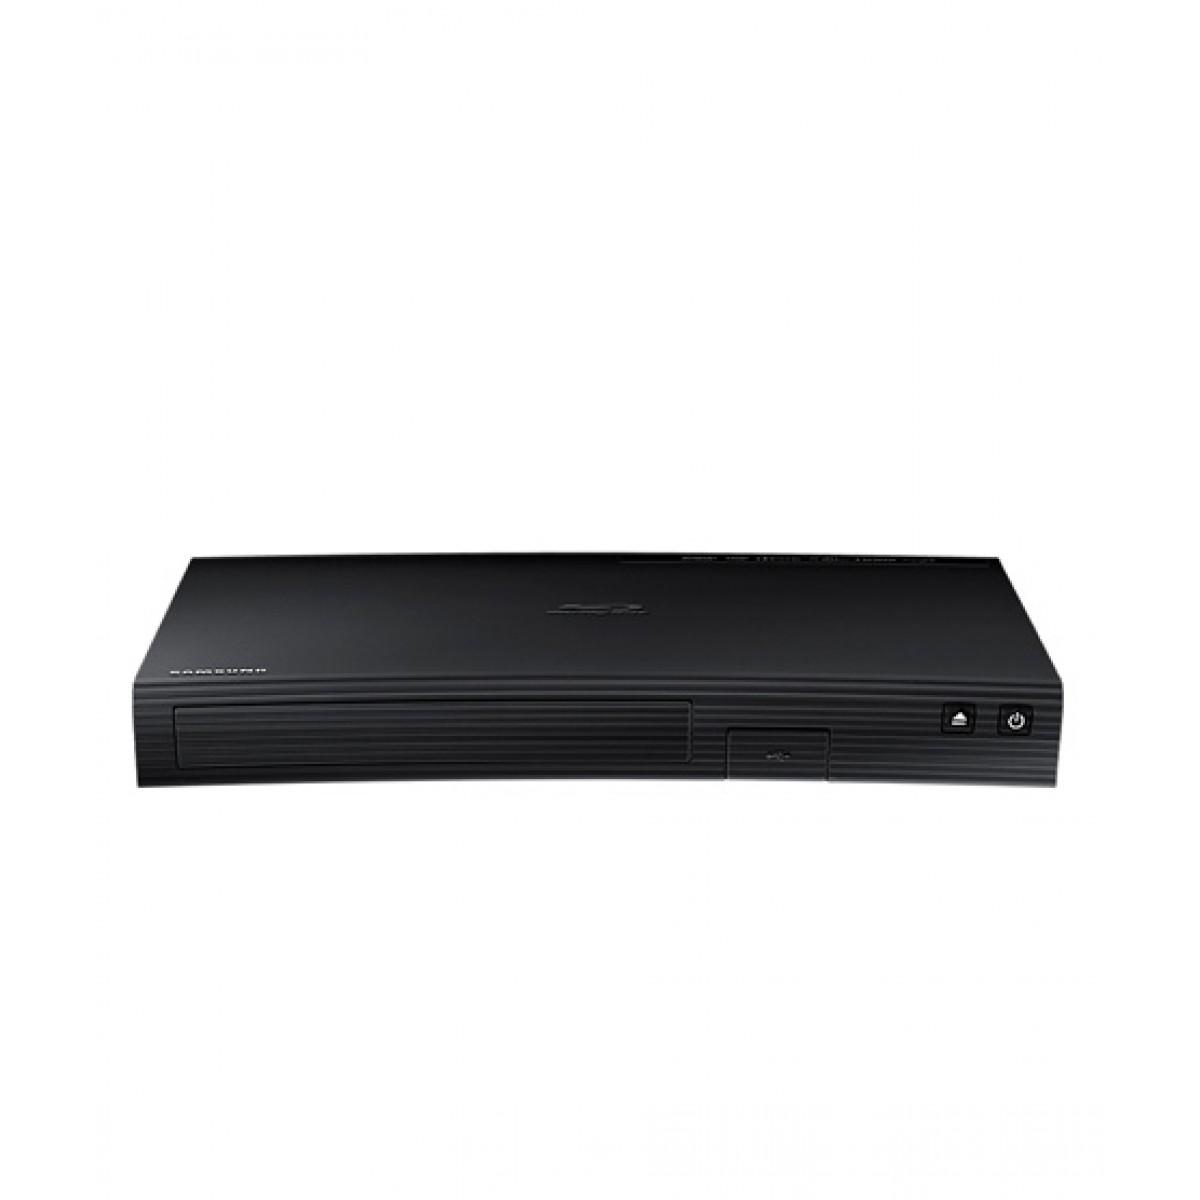 Samsung Blu-Ray DVD Player (BD-J5500)